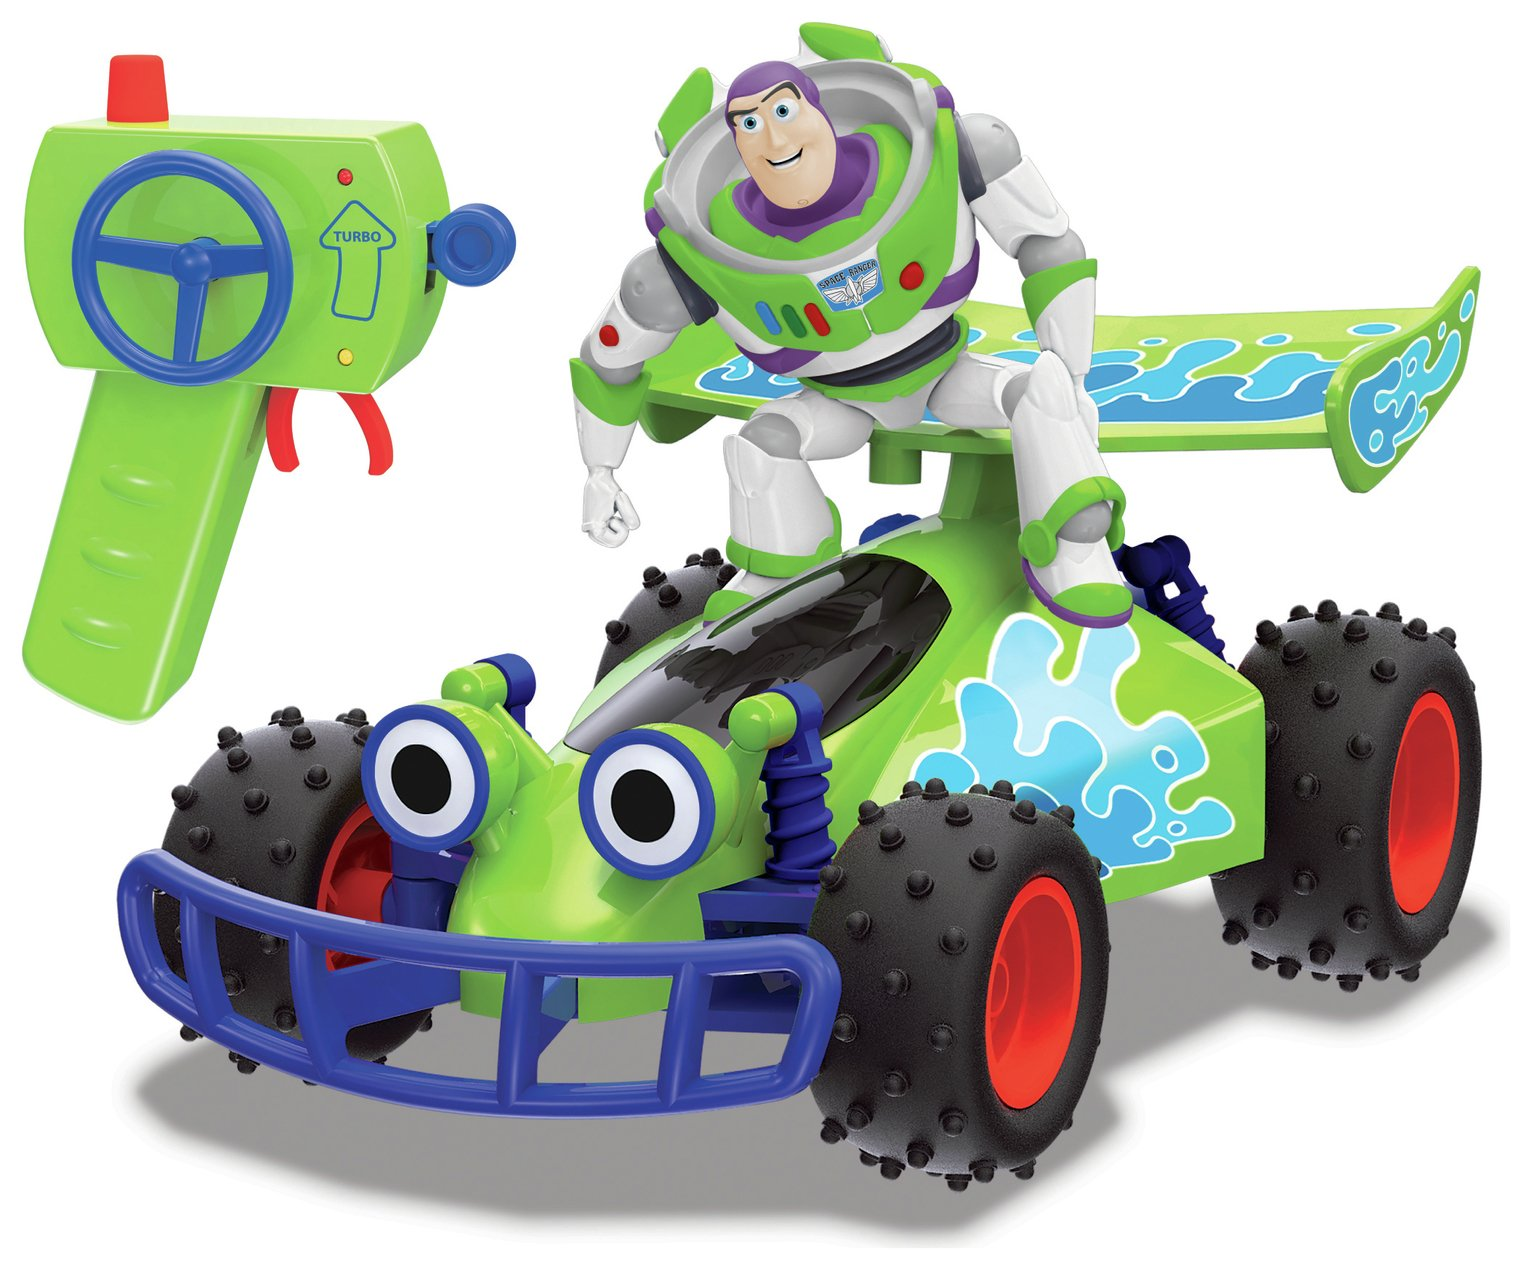 Disney Toy Story Buzz Lightyear 1:24 Radio Controlled Buggy